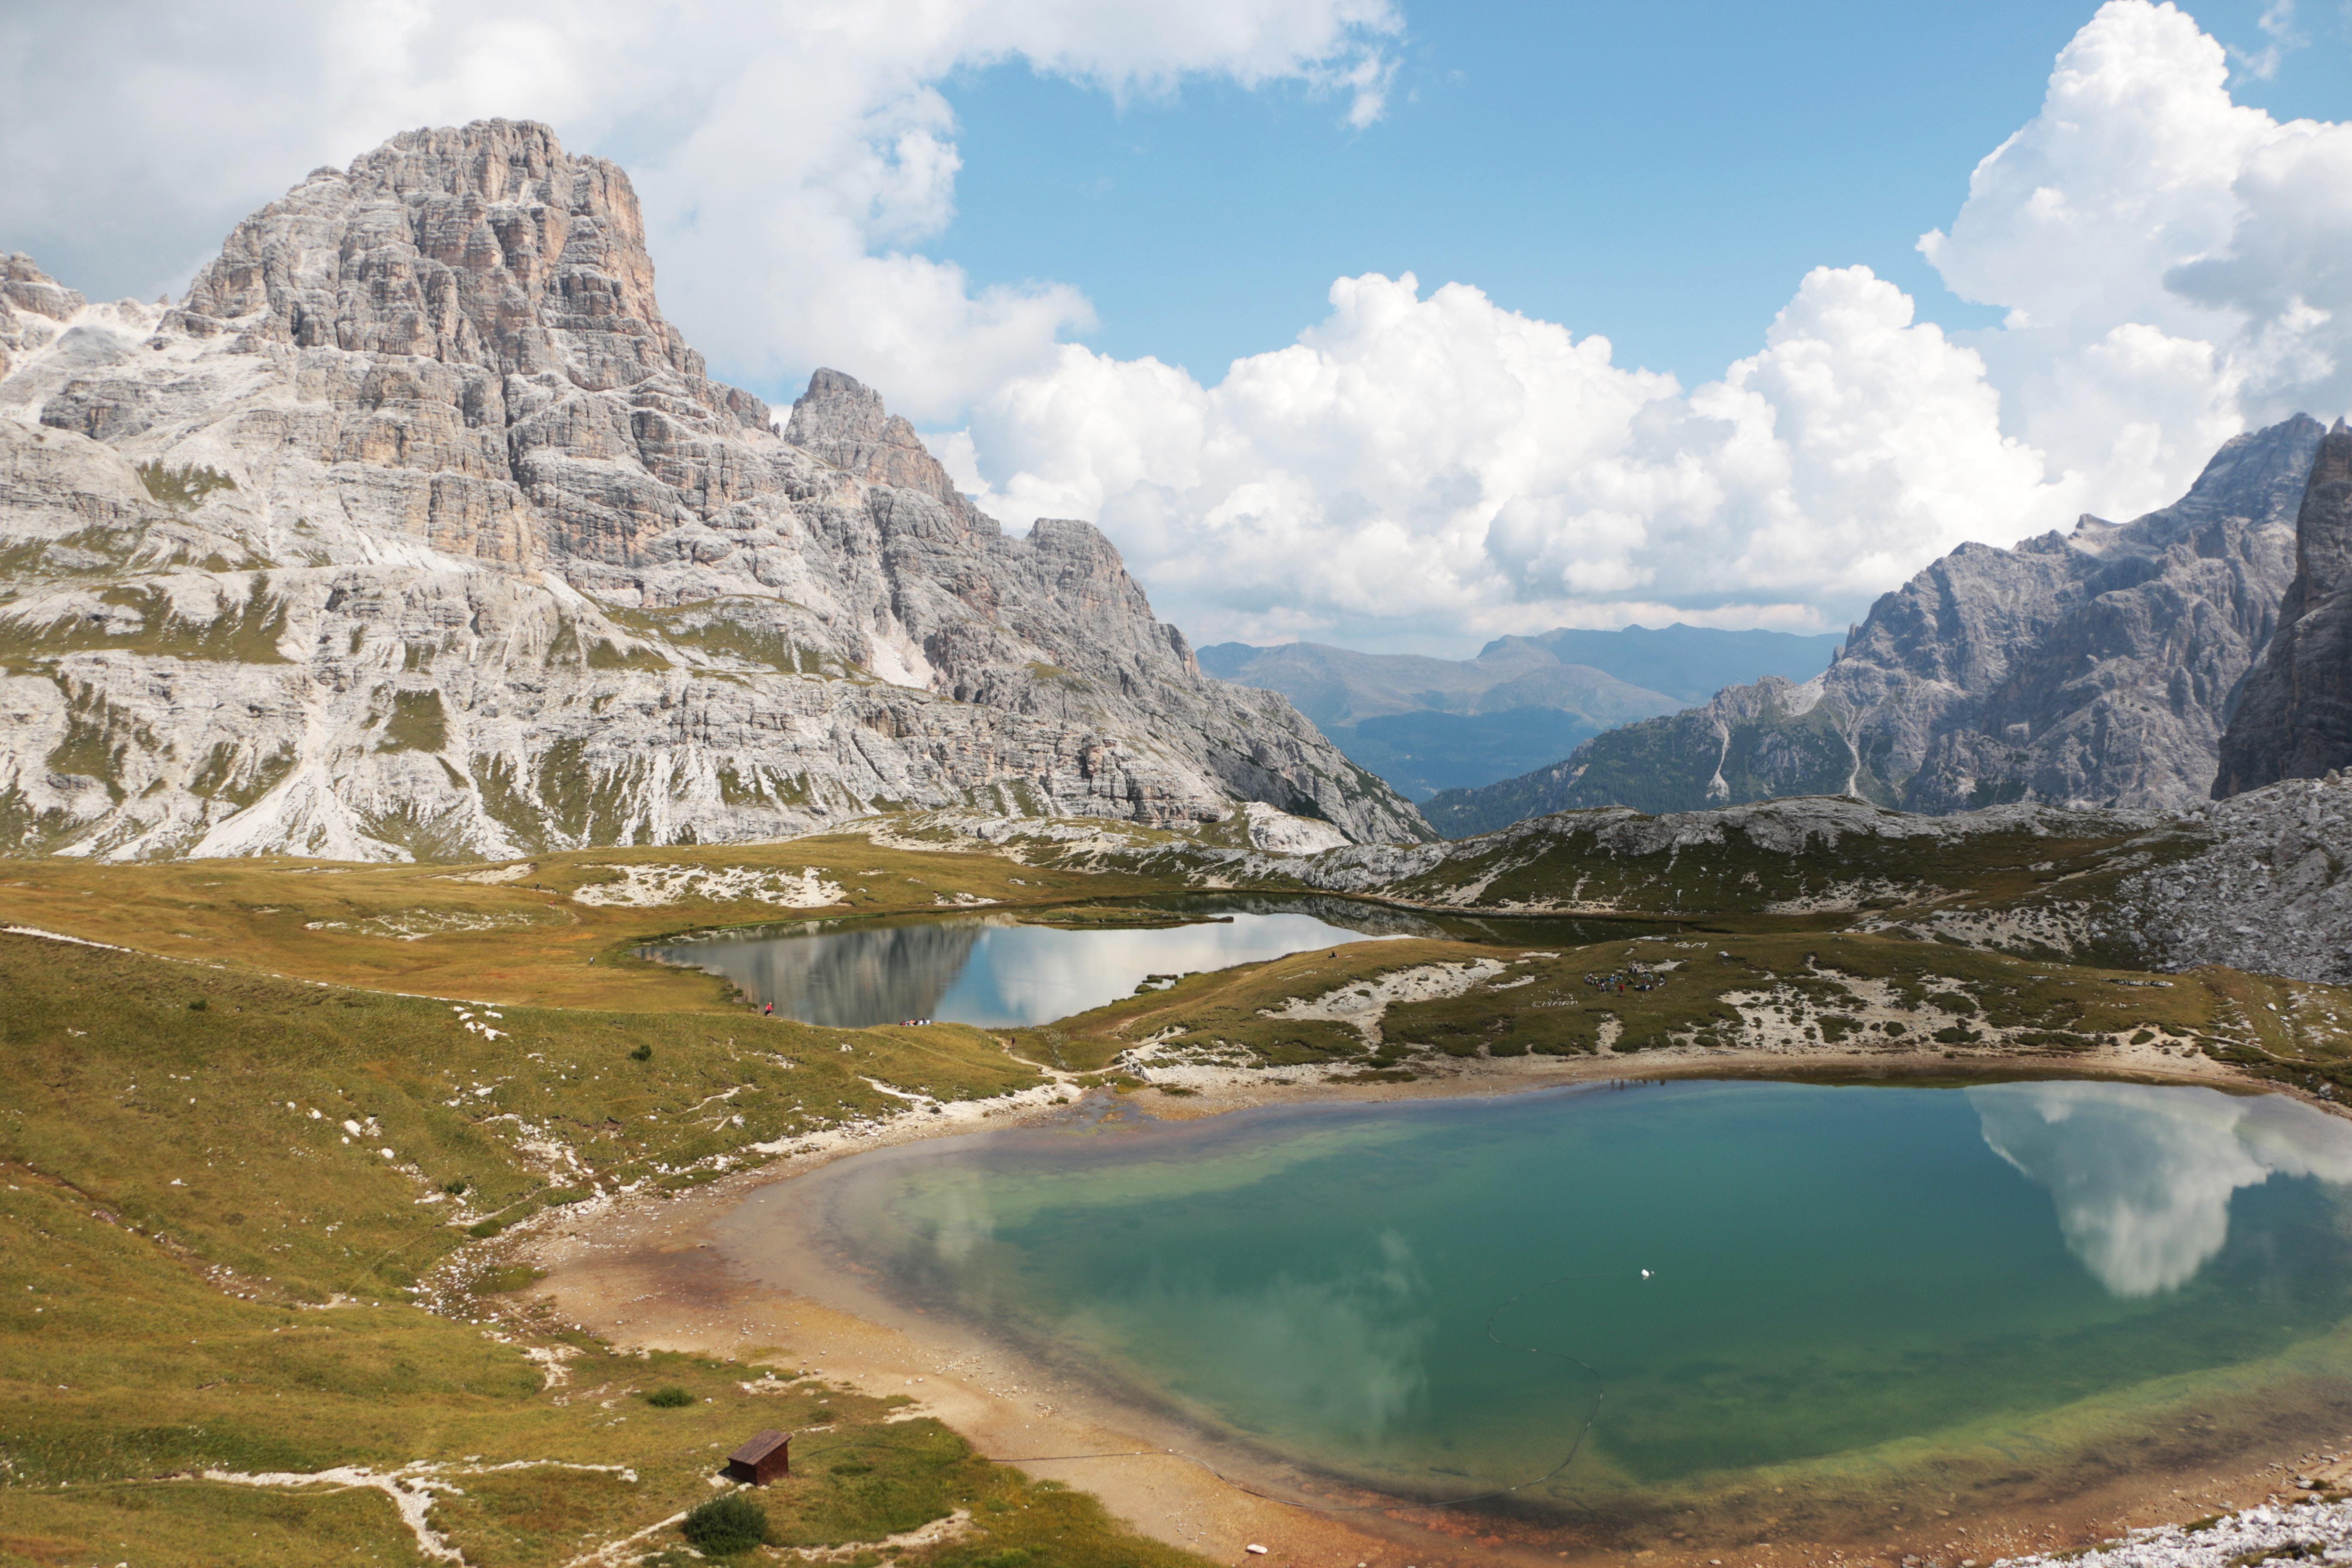 Calm oasis amidst a rocky mountain landscape